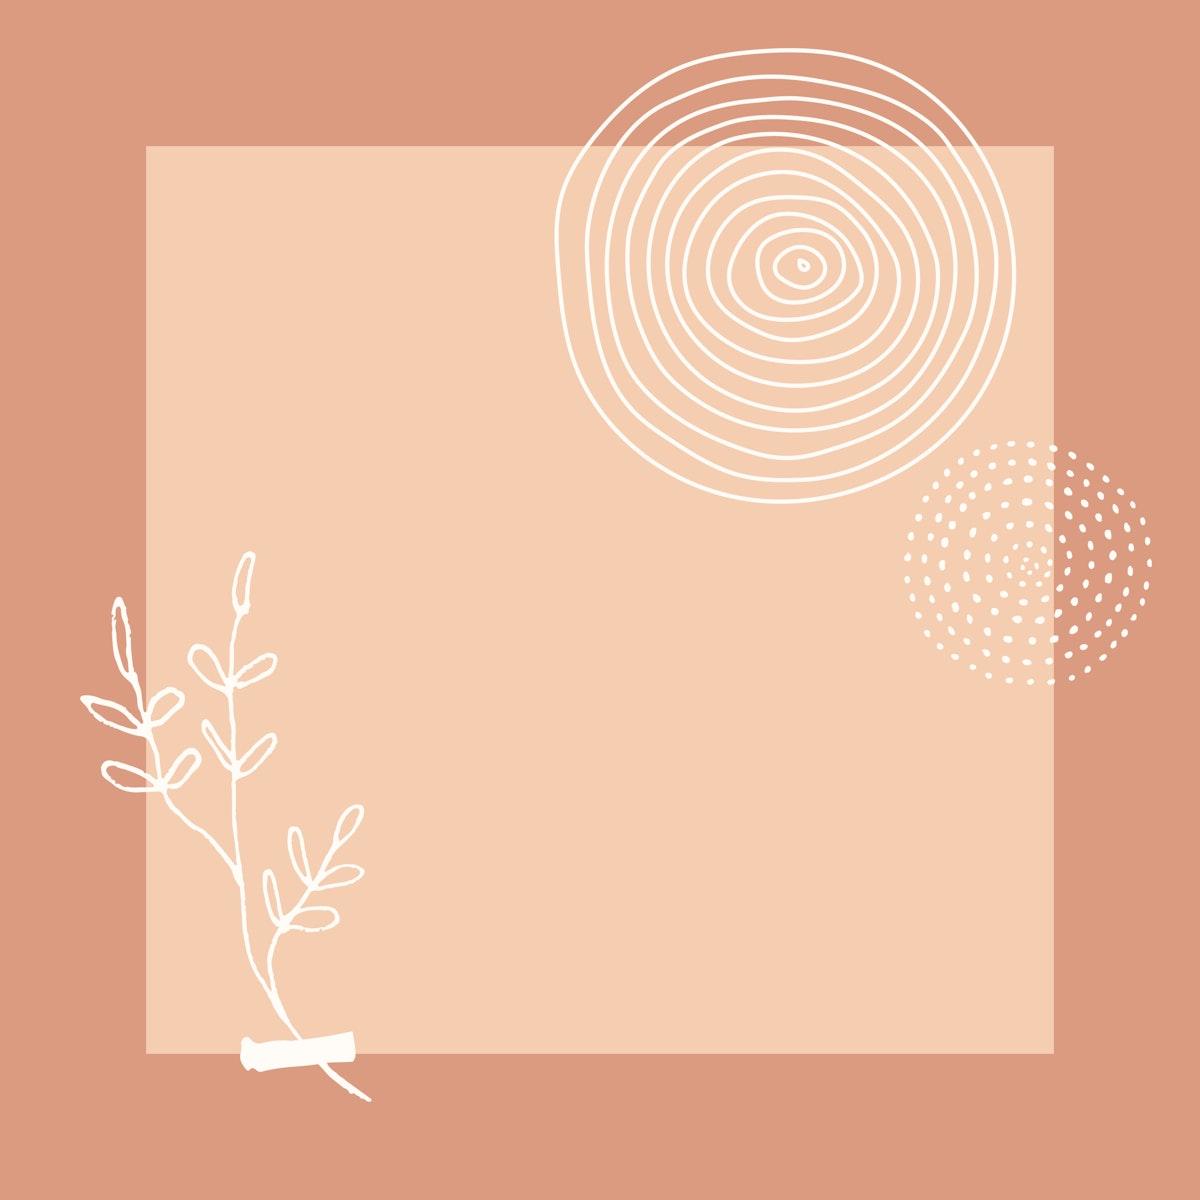 Blank pink poster design vector